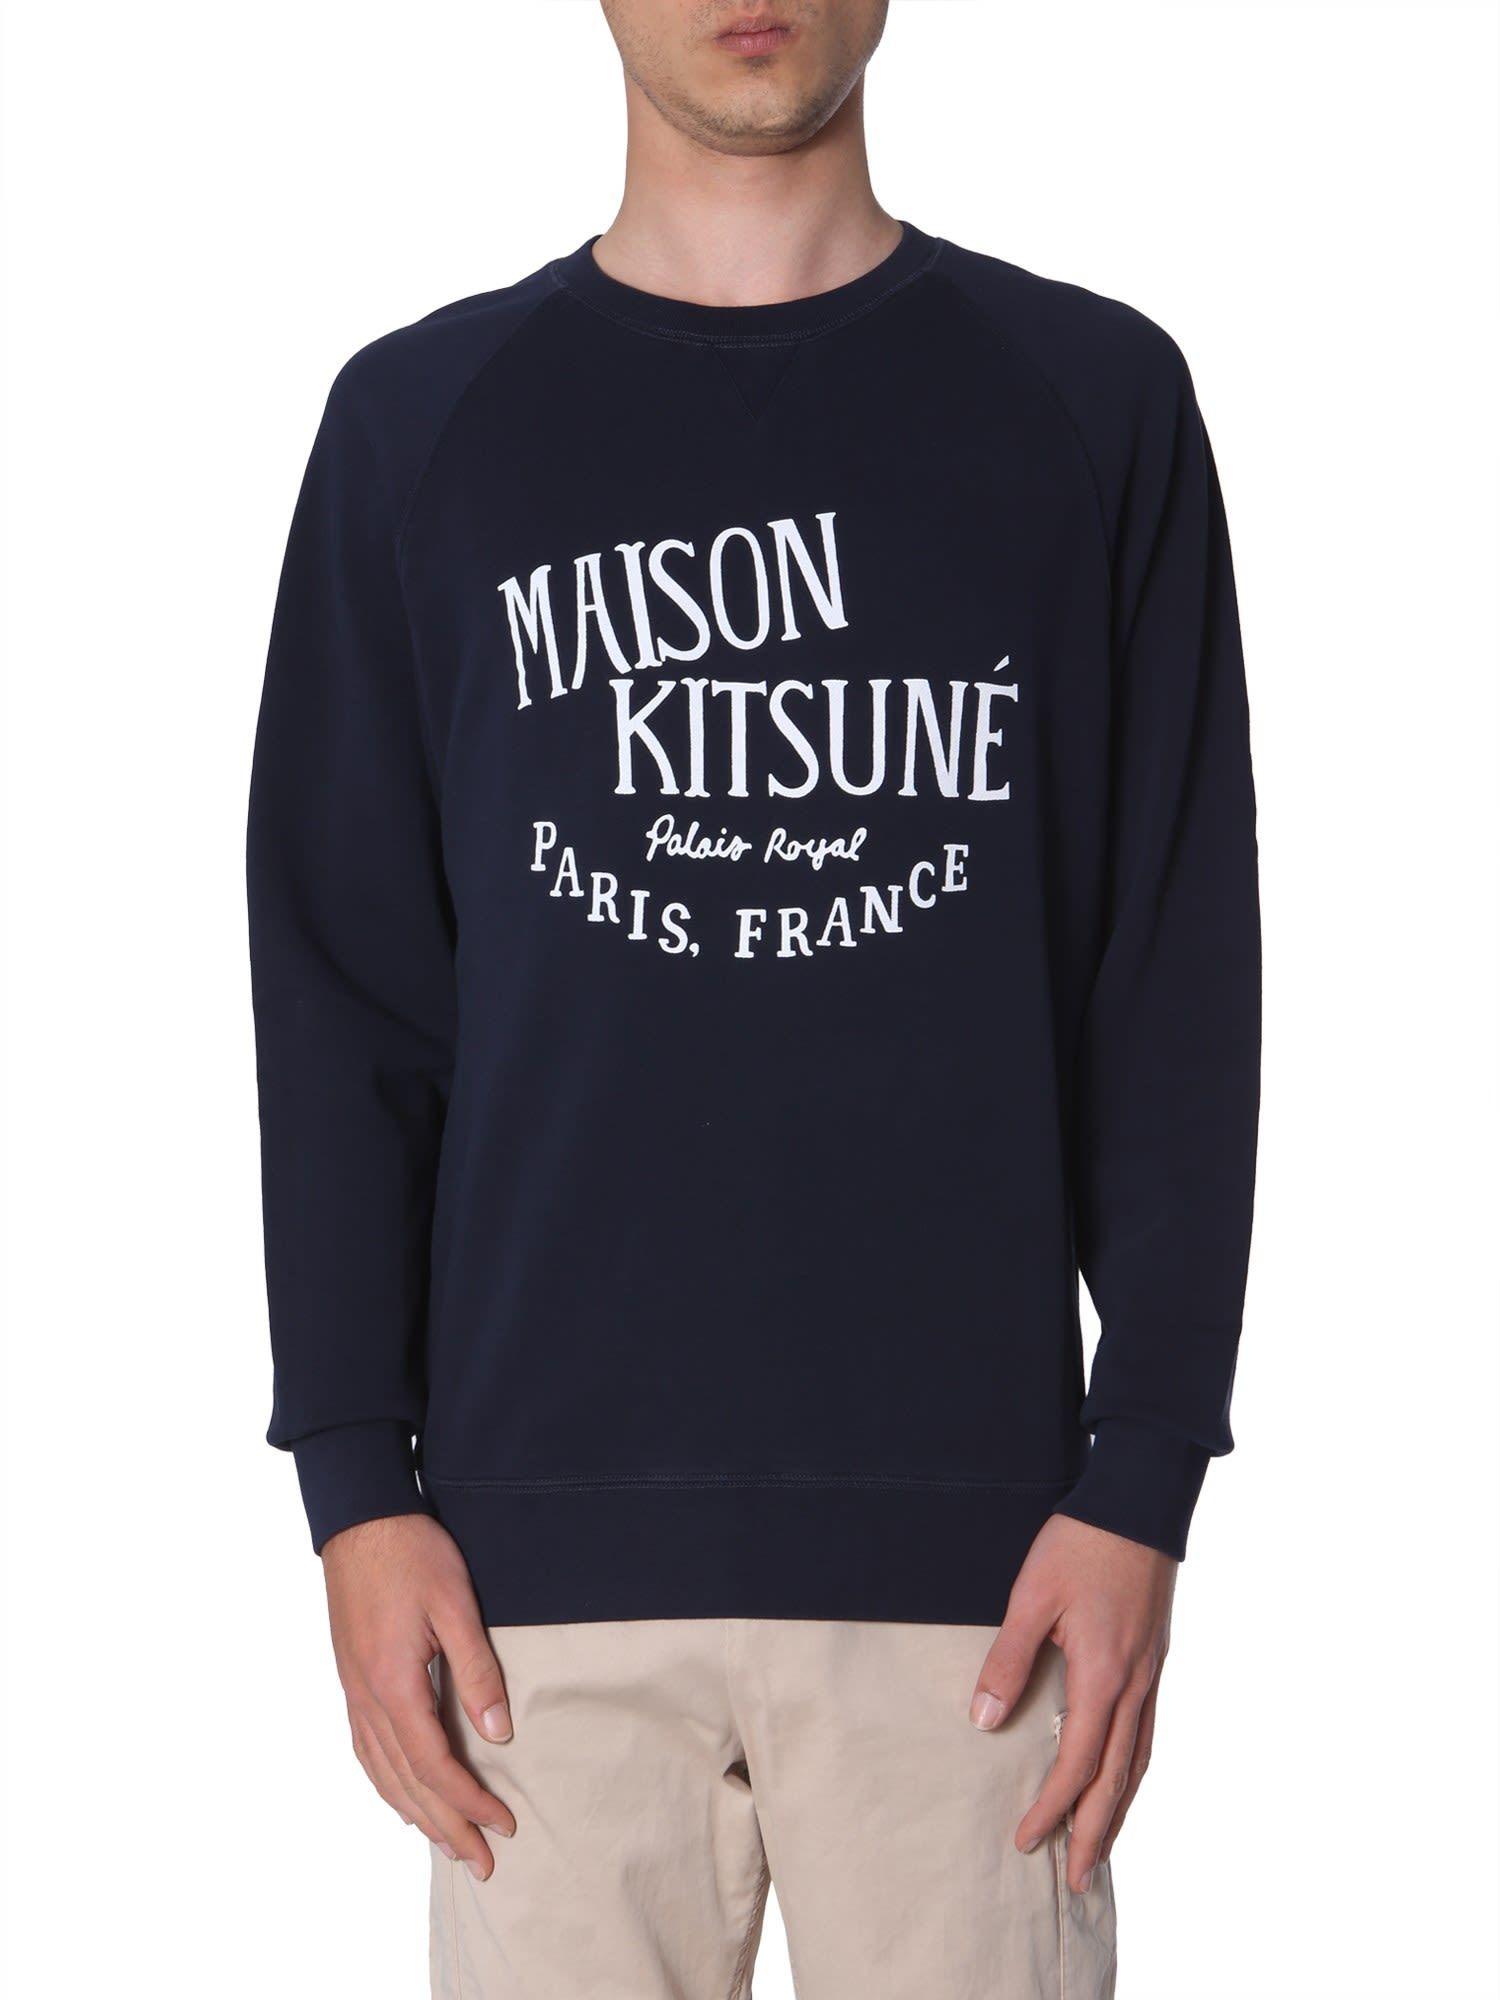 Maison Kitsune Palais Royal Print Sweatshirt Maisonkitsune Cloth Printed Sweatshirts Sweatshirts Maison Kitsune [ 2000 x 1500 Pixel ]